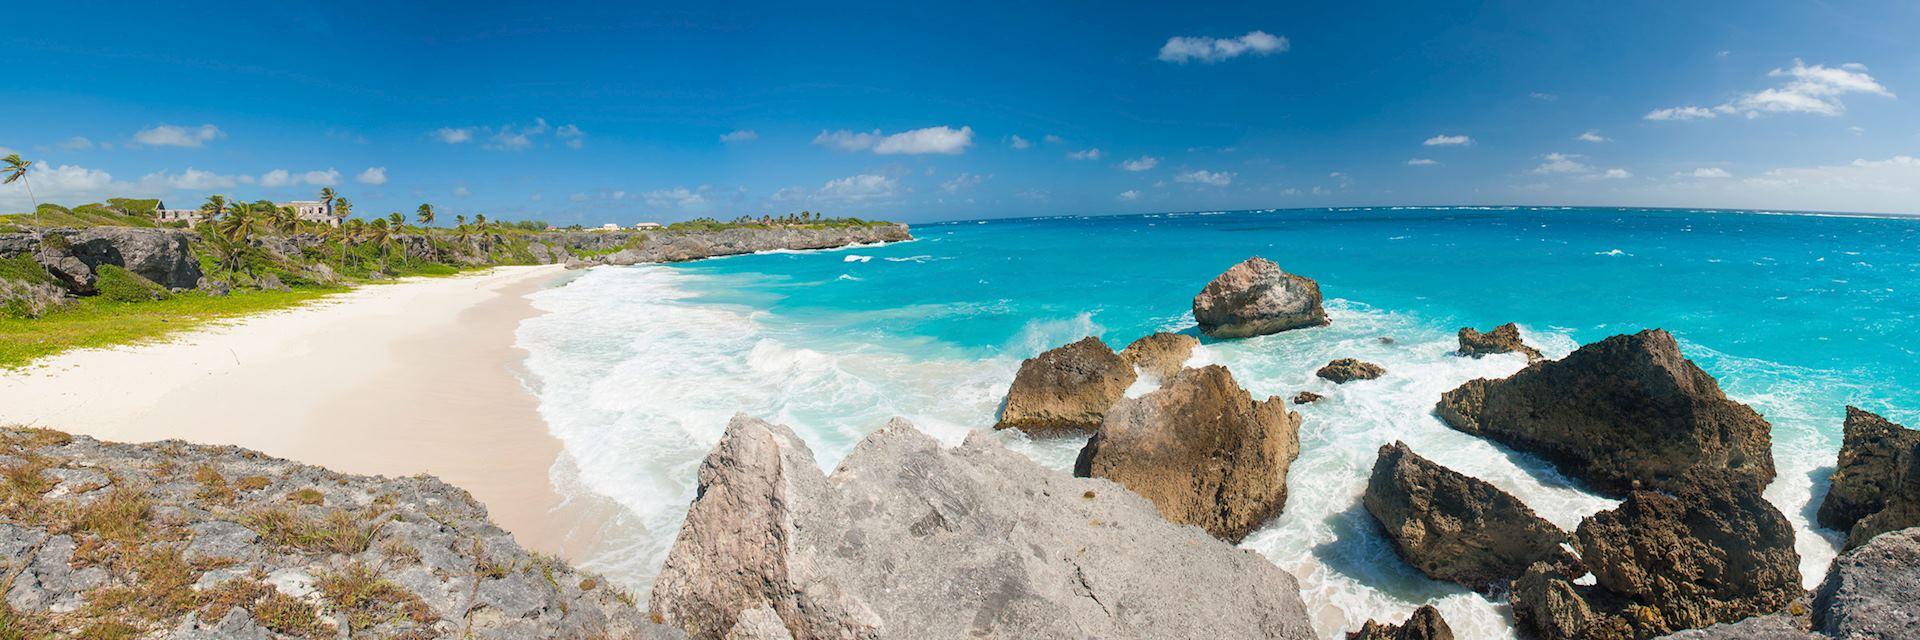 Harrismith's white sandy beach, Barbados